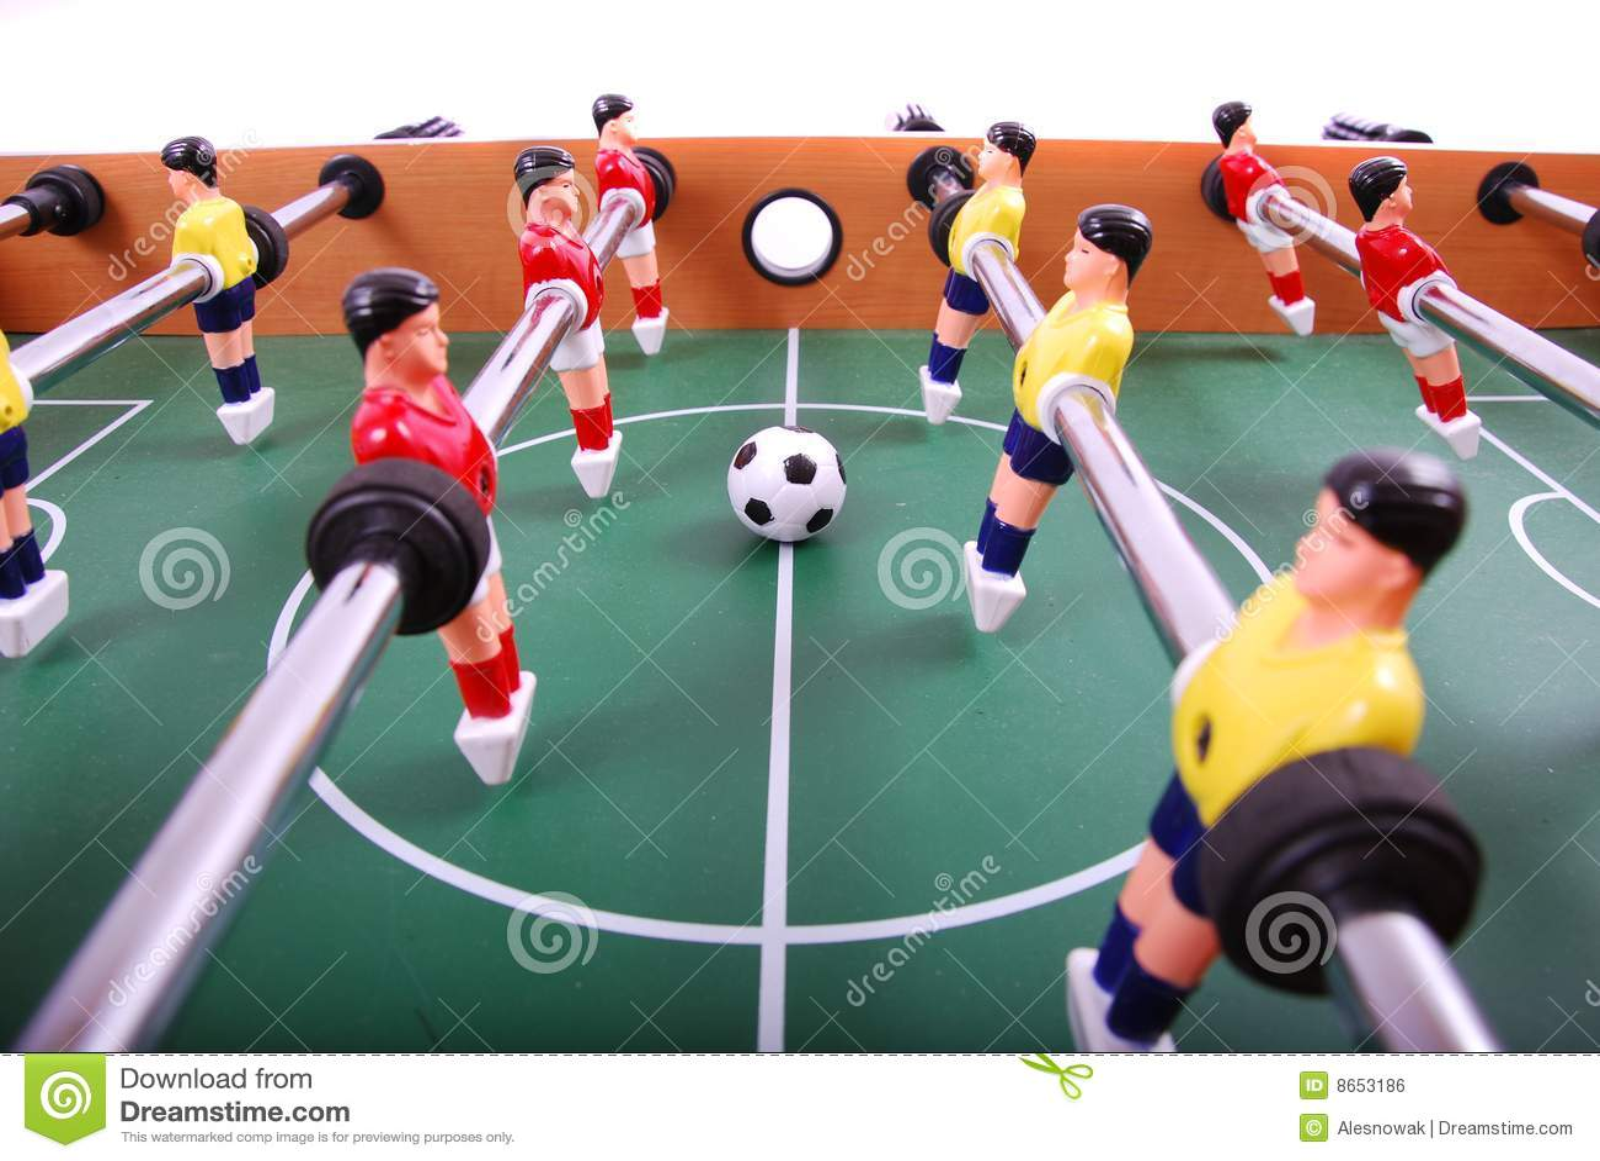 Le football de Tableau